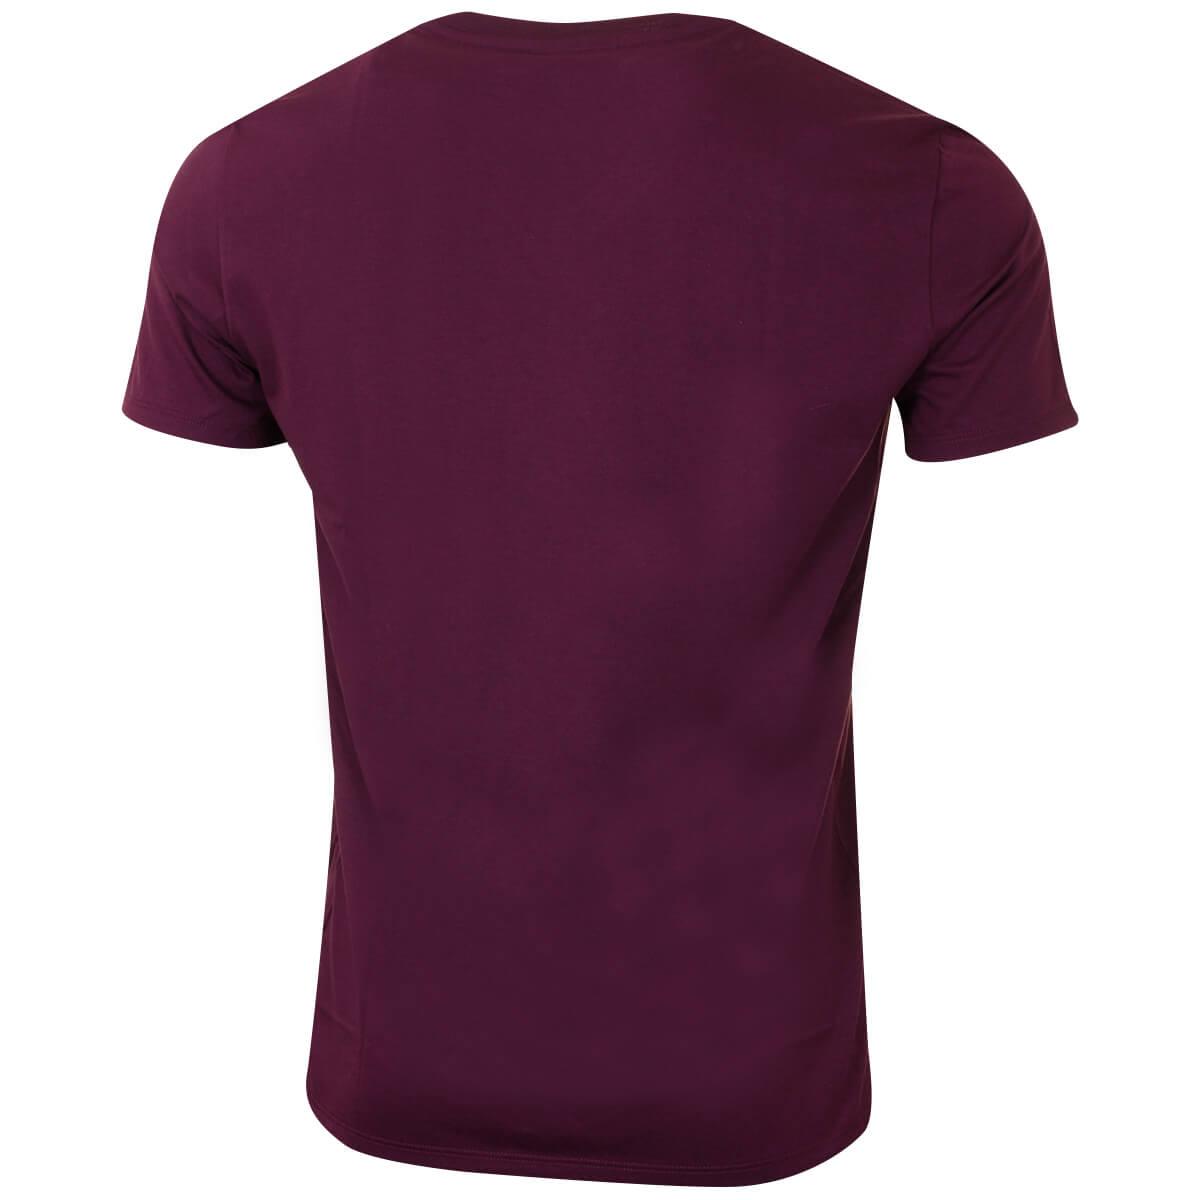 Lacoste-Mens-2019-SS-V-Neck-TH6710-Short-Sleeve-Pima-Cotton-Tee-T-Shirt thumbnail 12